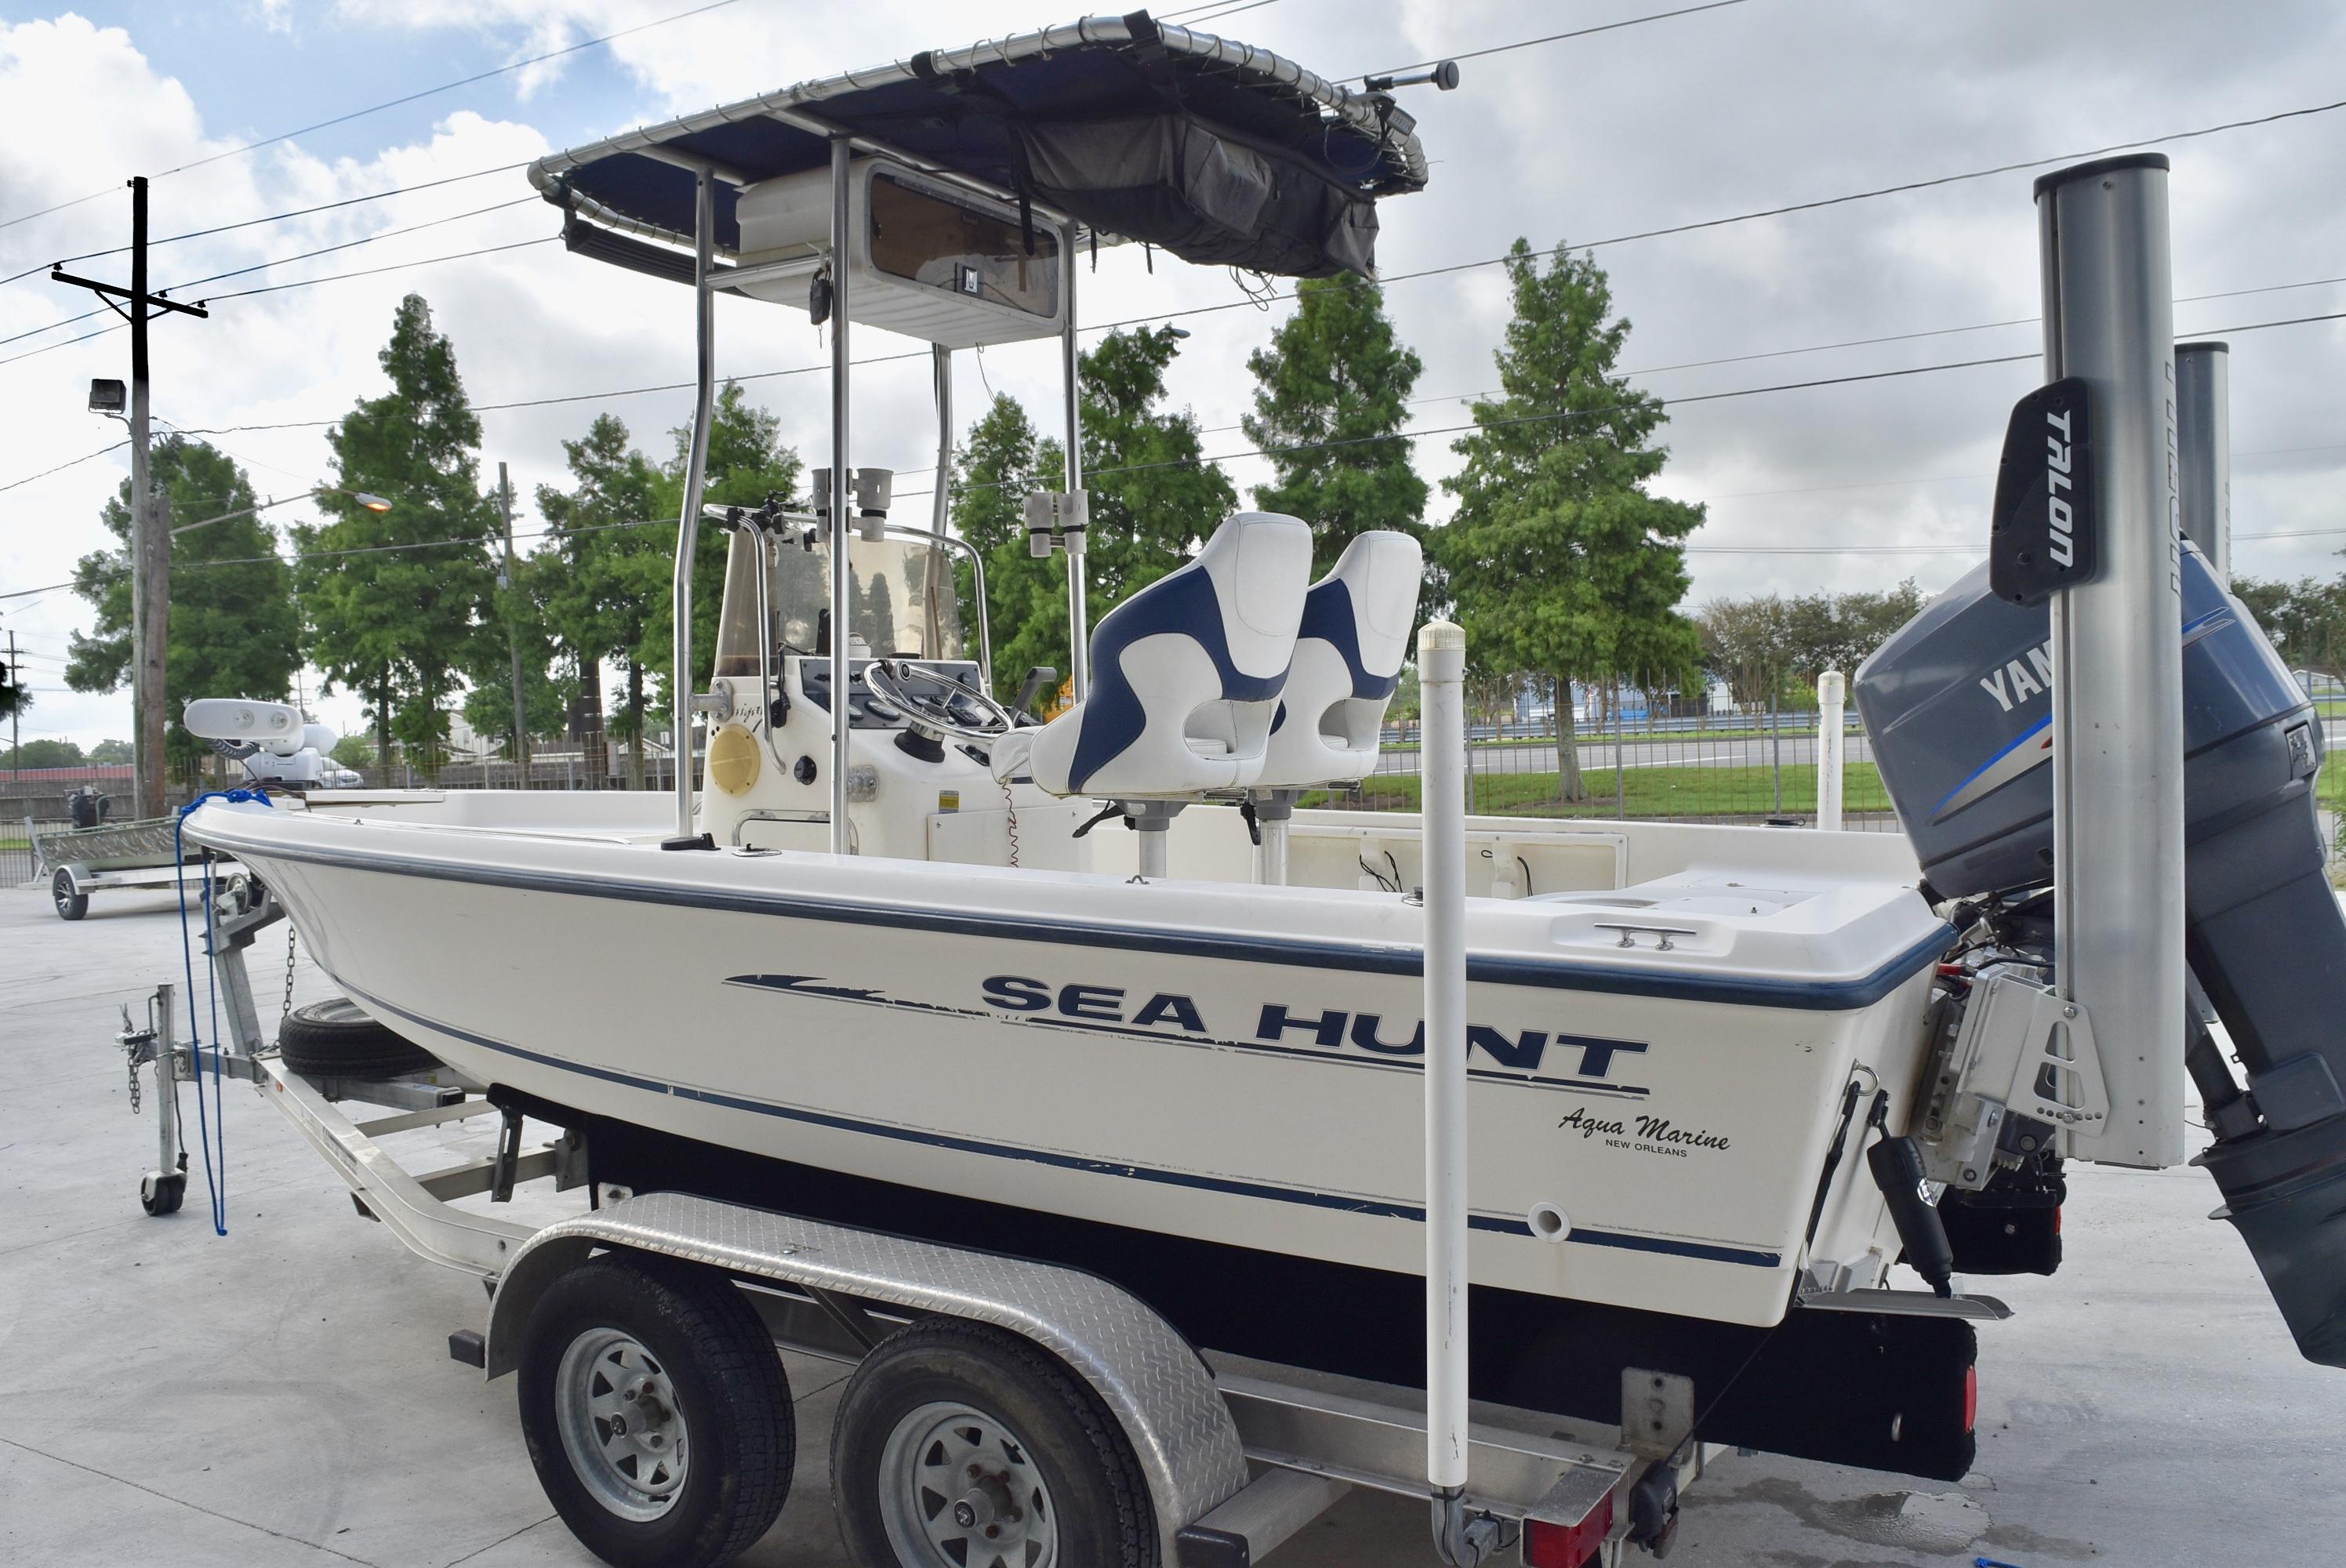 2002 Sea Hunt boat for sale, model of the boat is Navigator 20 & Image # 7 of 7